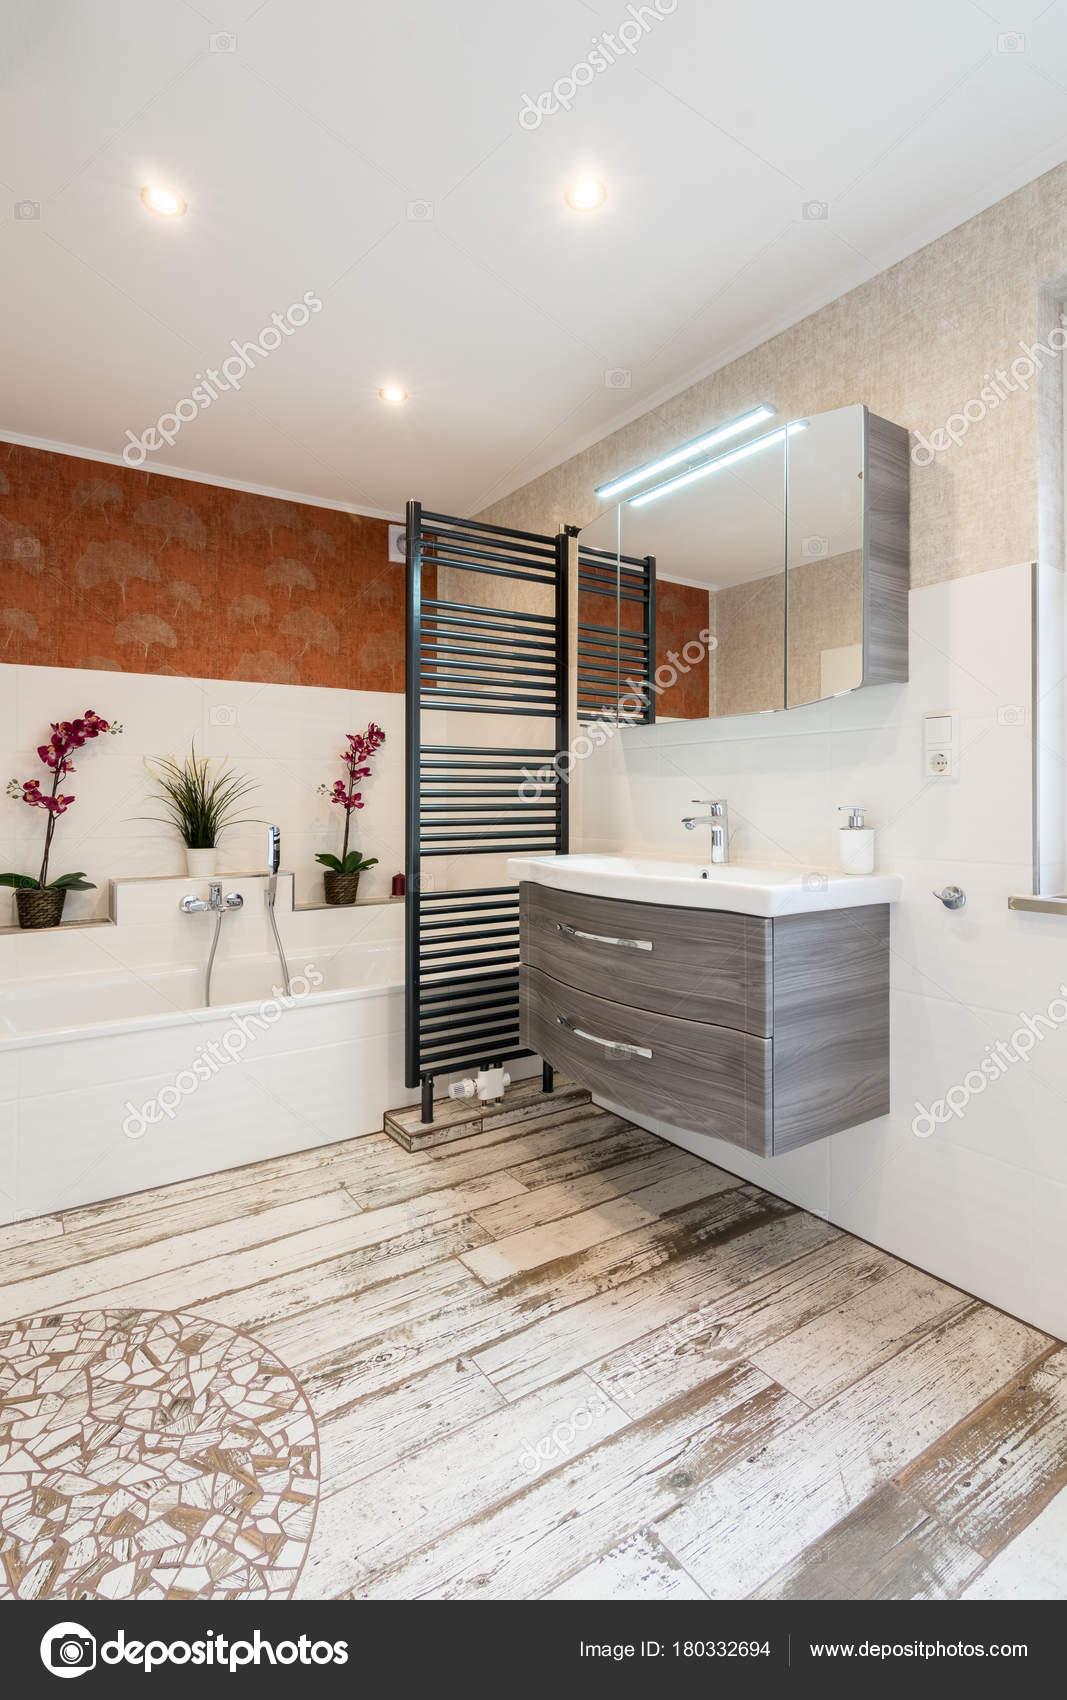 https://st3.depositphotos.com/5248351/18033/i/1600/depositphotos_180332694-stock-photo-modern-bathroom-in-vintage-style.jpg